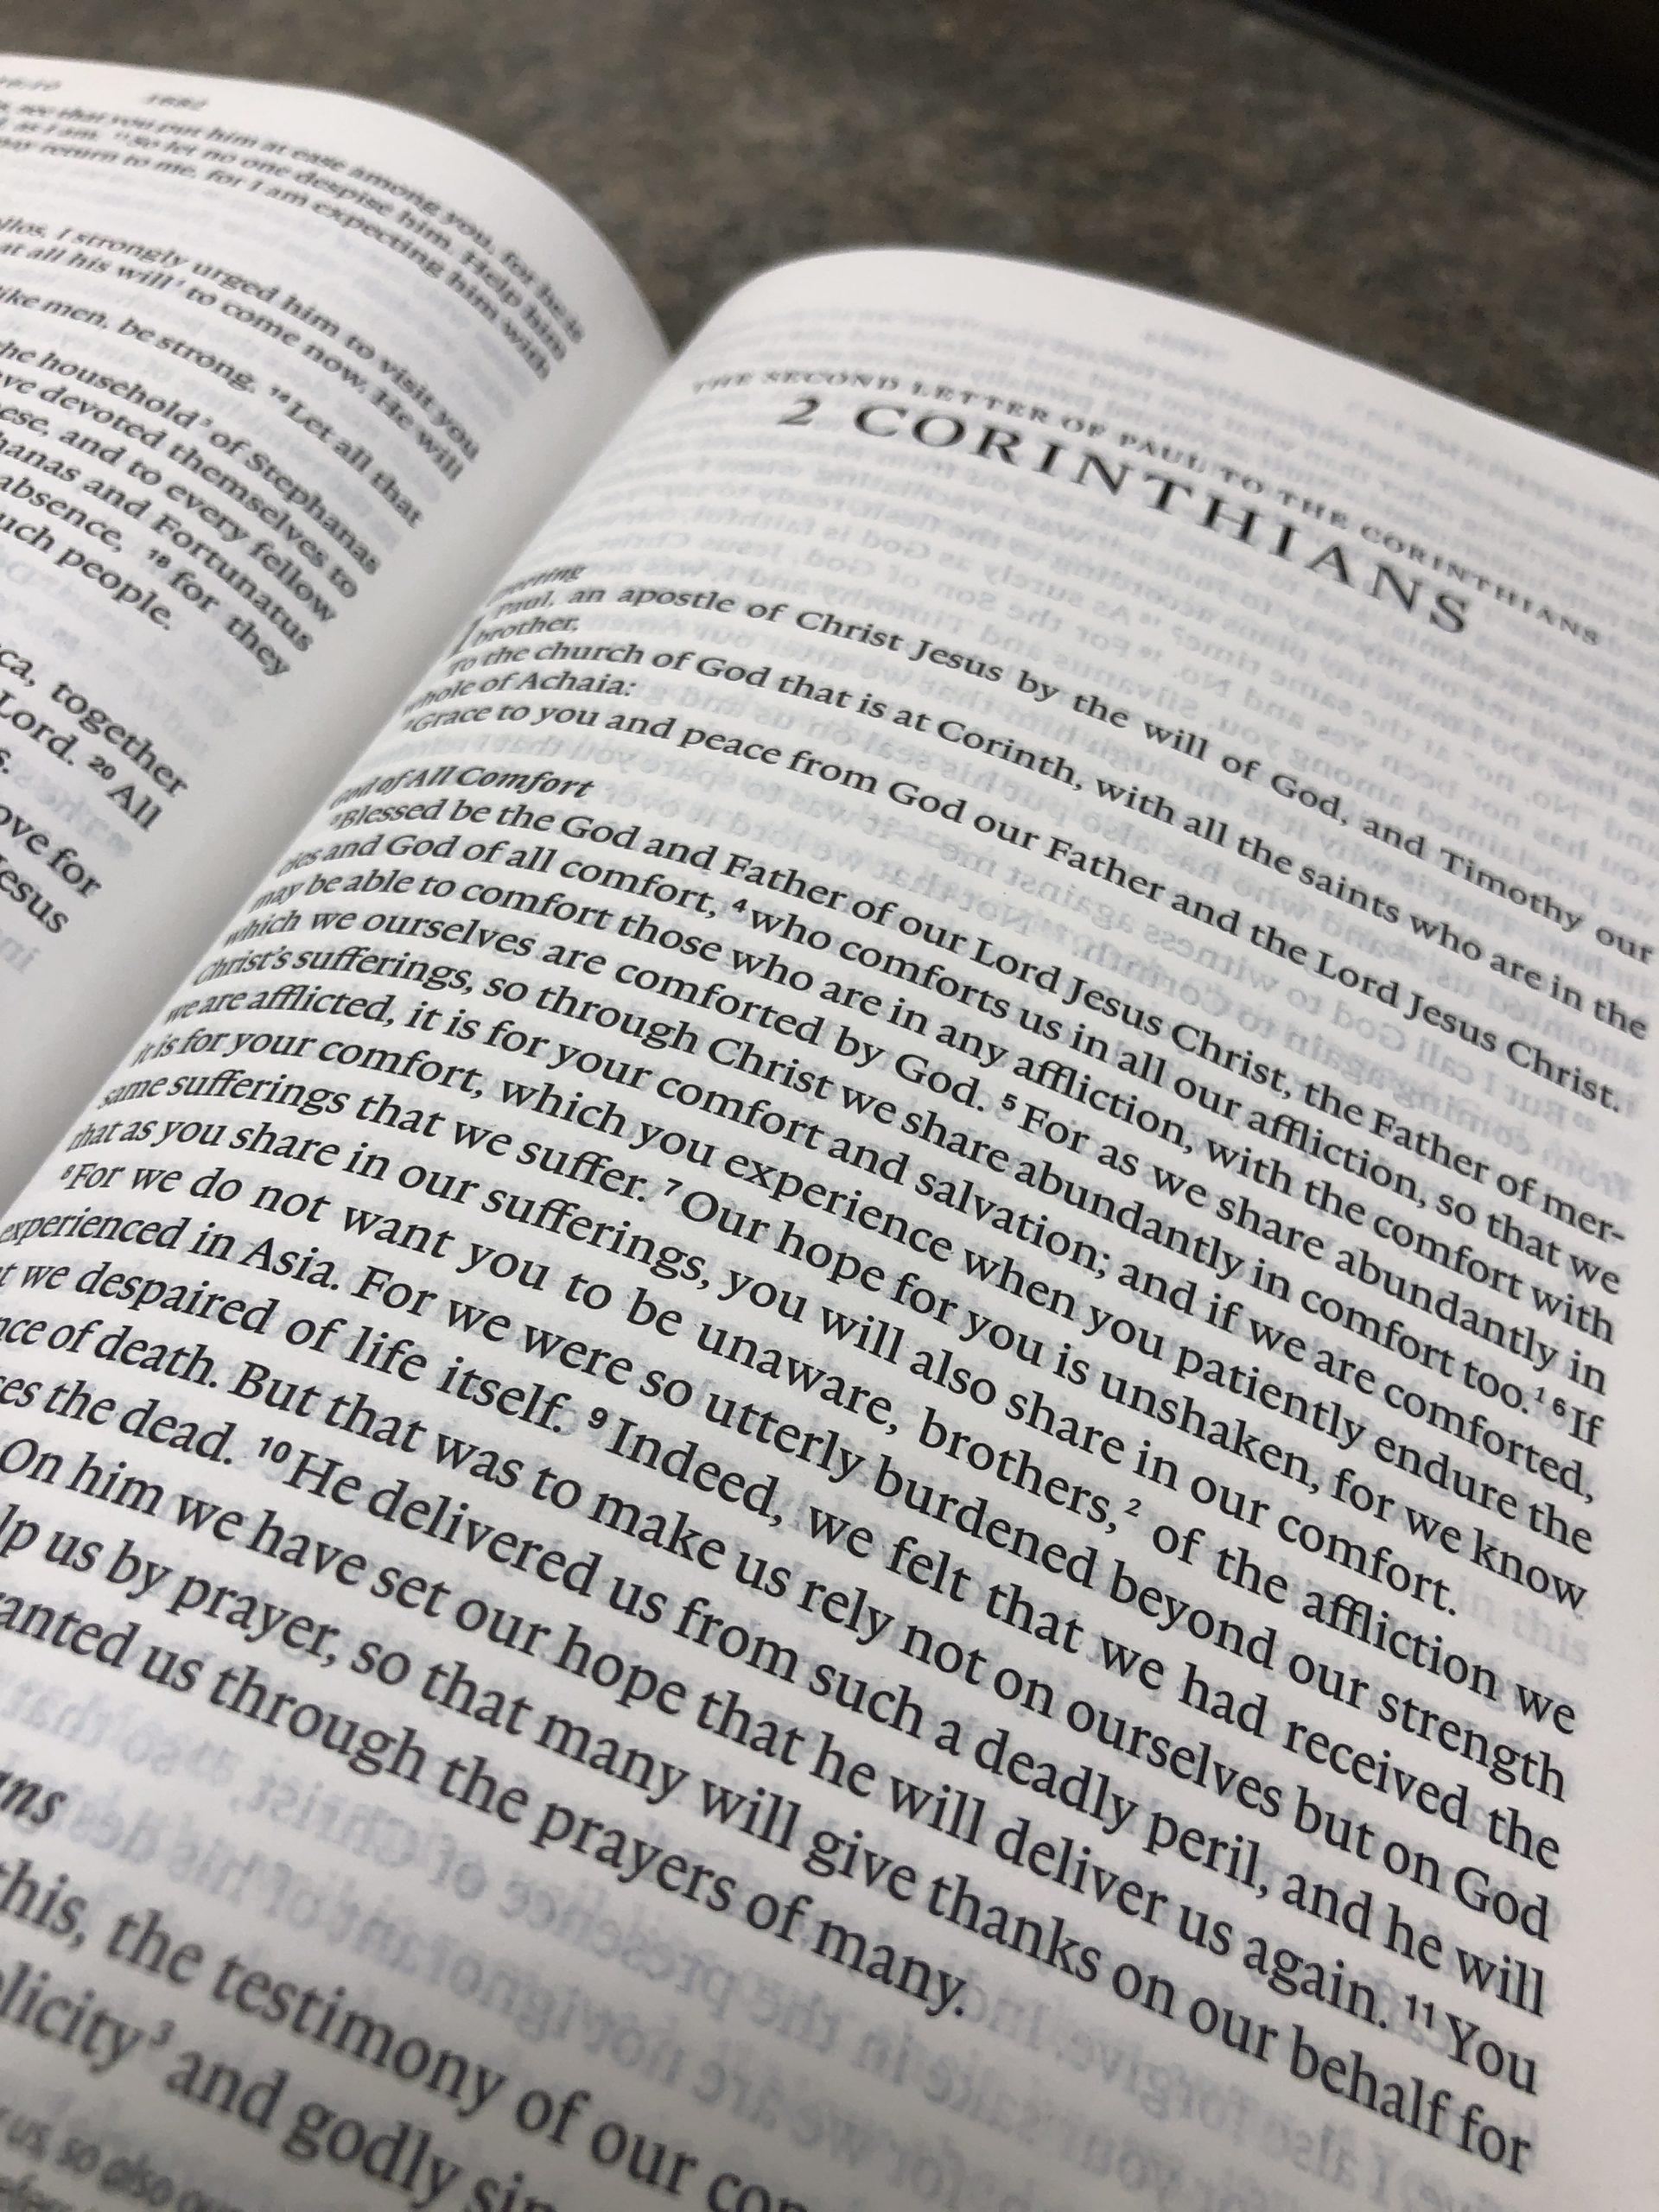 An Overview of 2 Corinthians